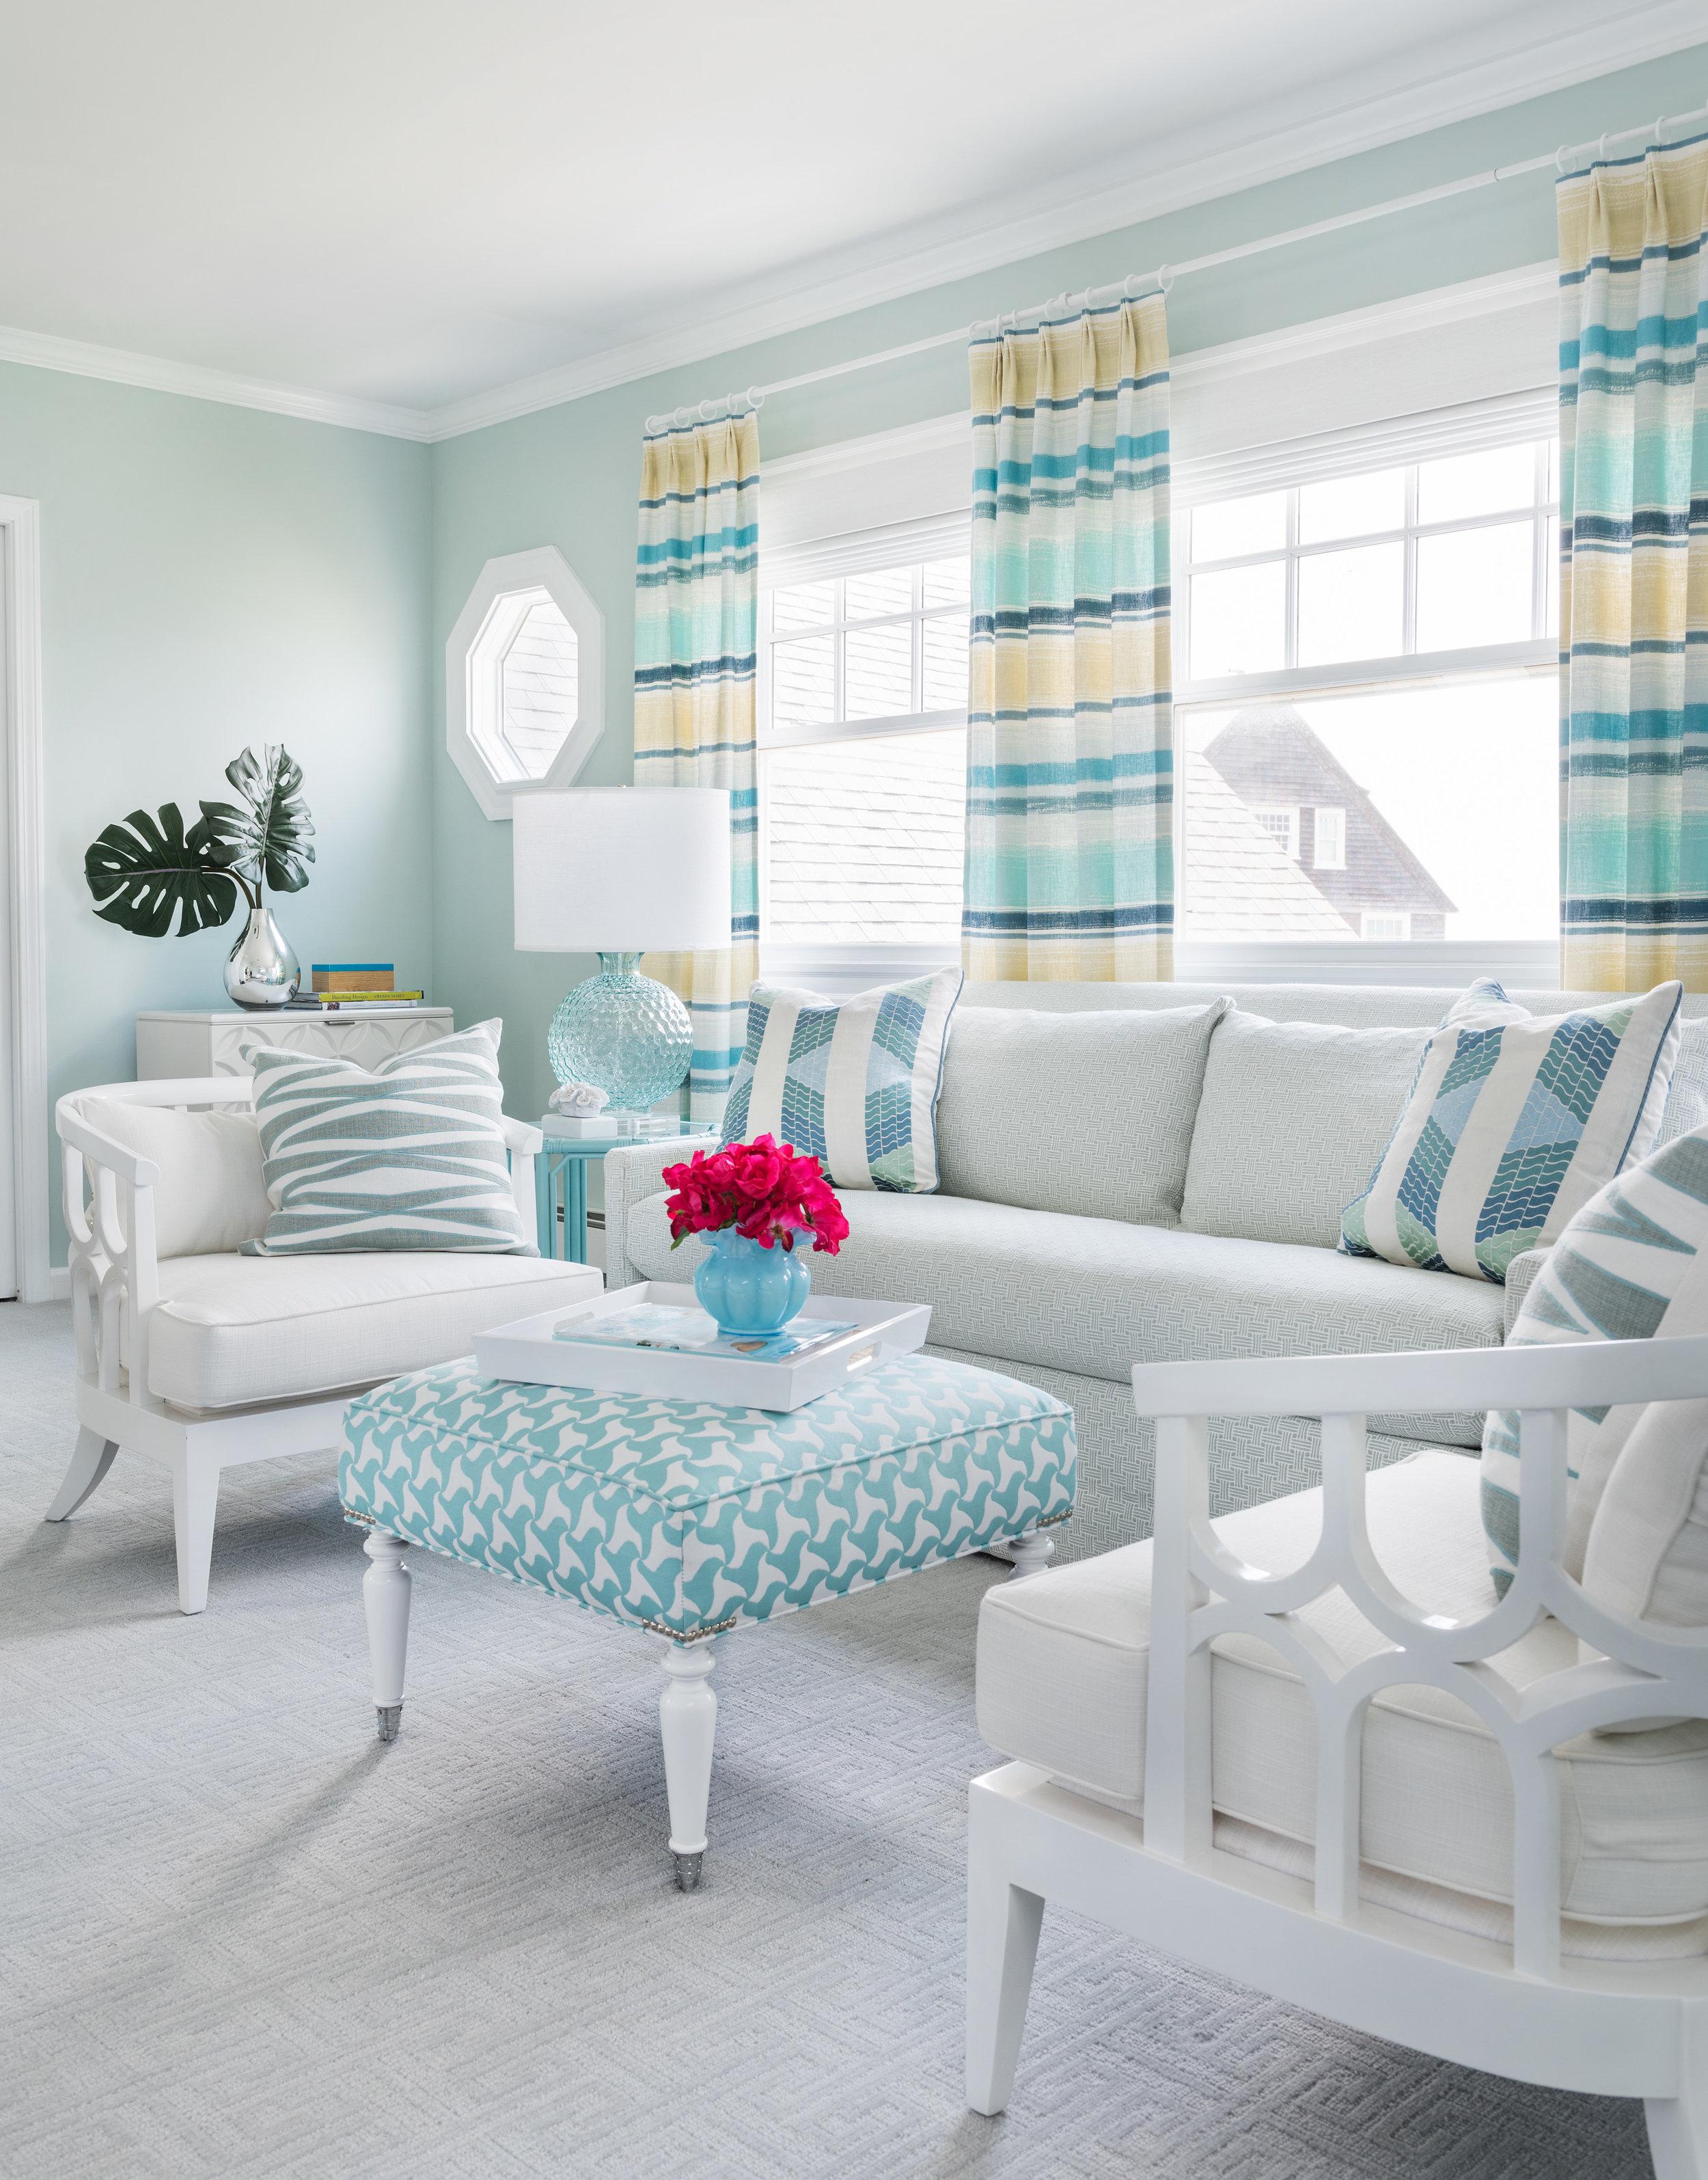 interior design, Easton's Beach, Newport, Rhode Island, beach decor, beach style, turquoise, aqua,